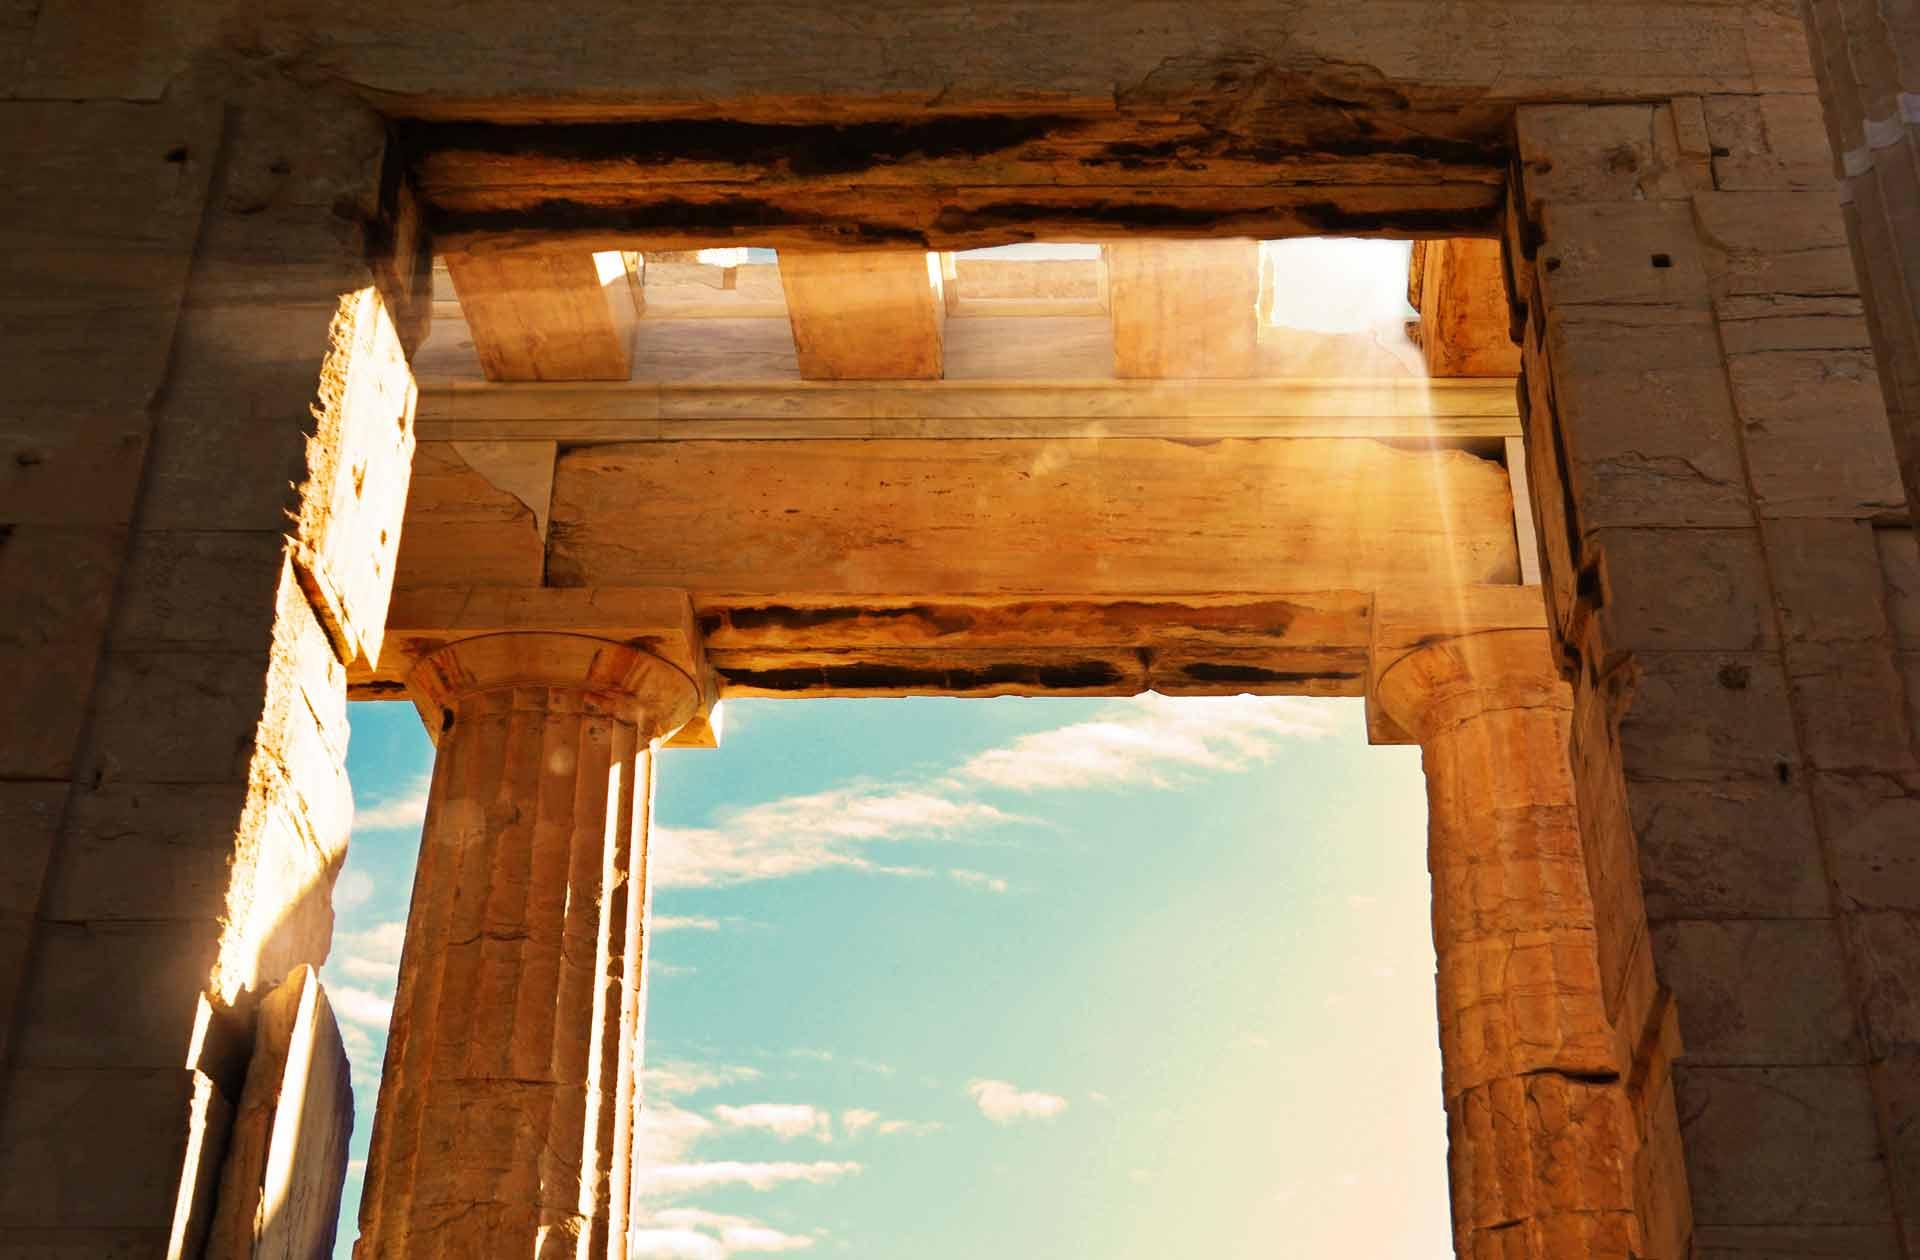 la acropolis de Atenas